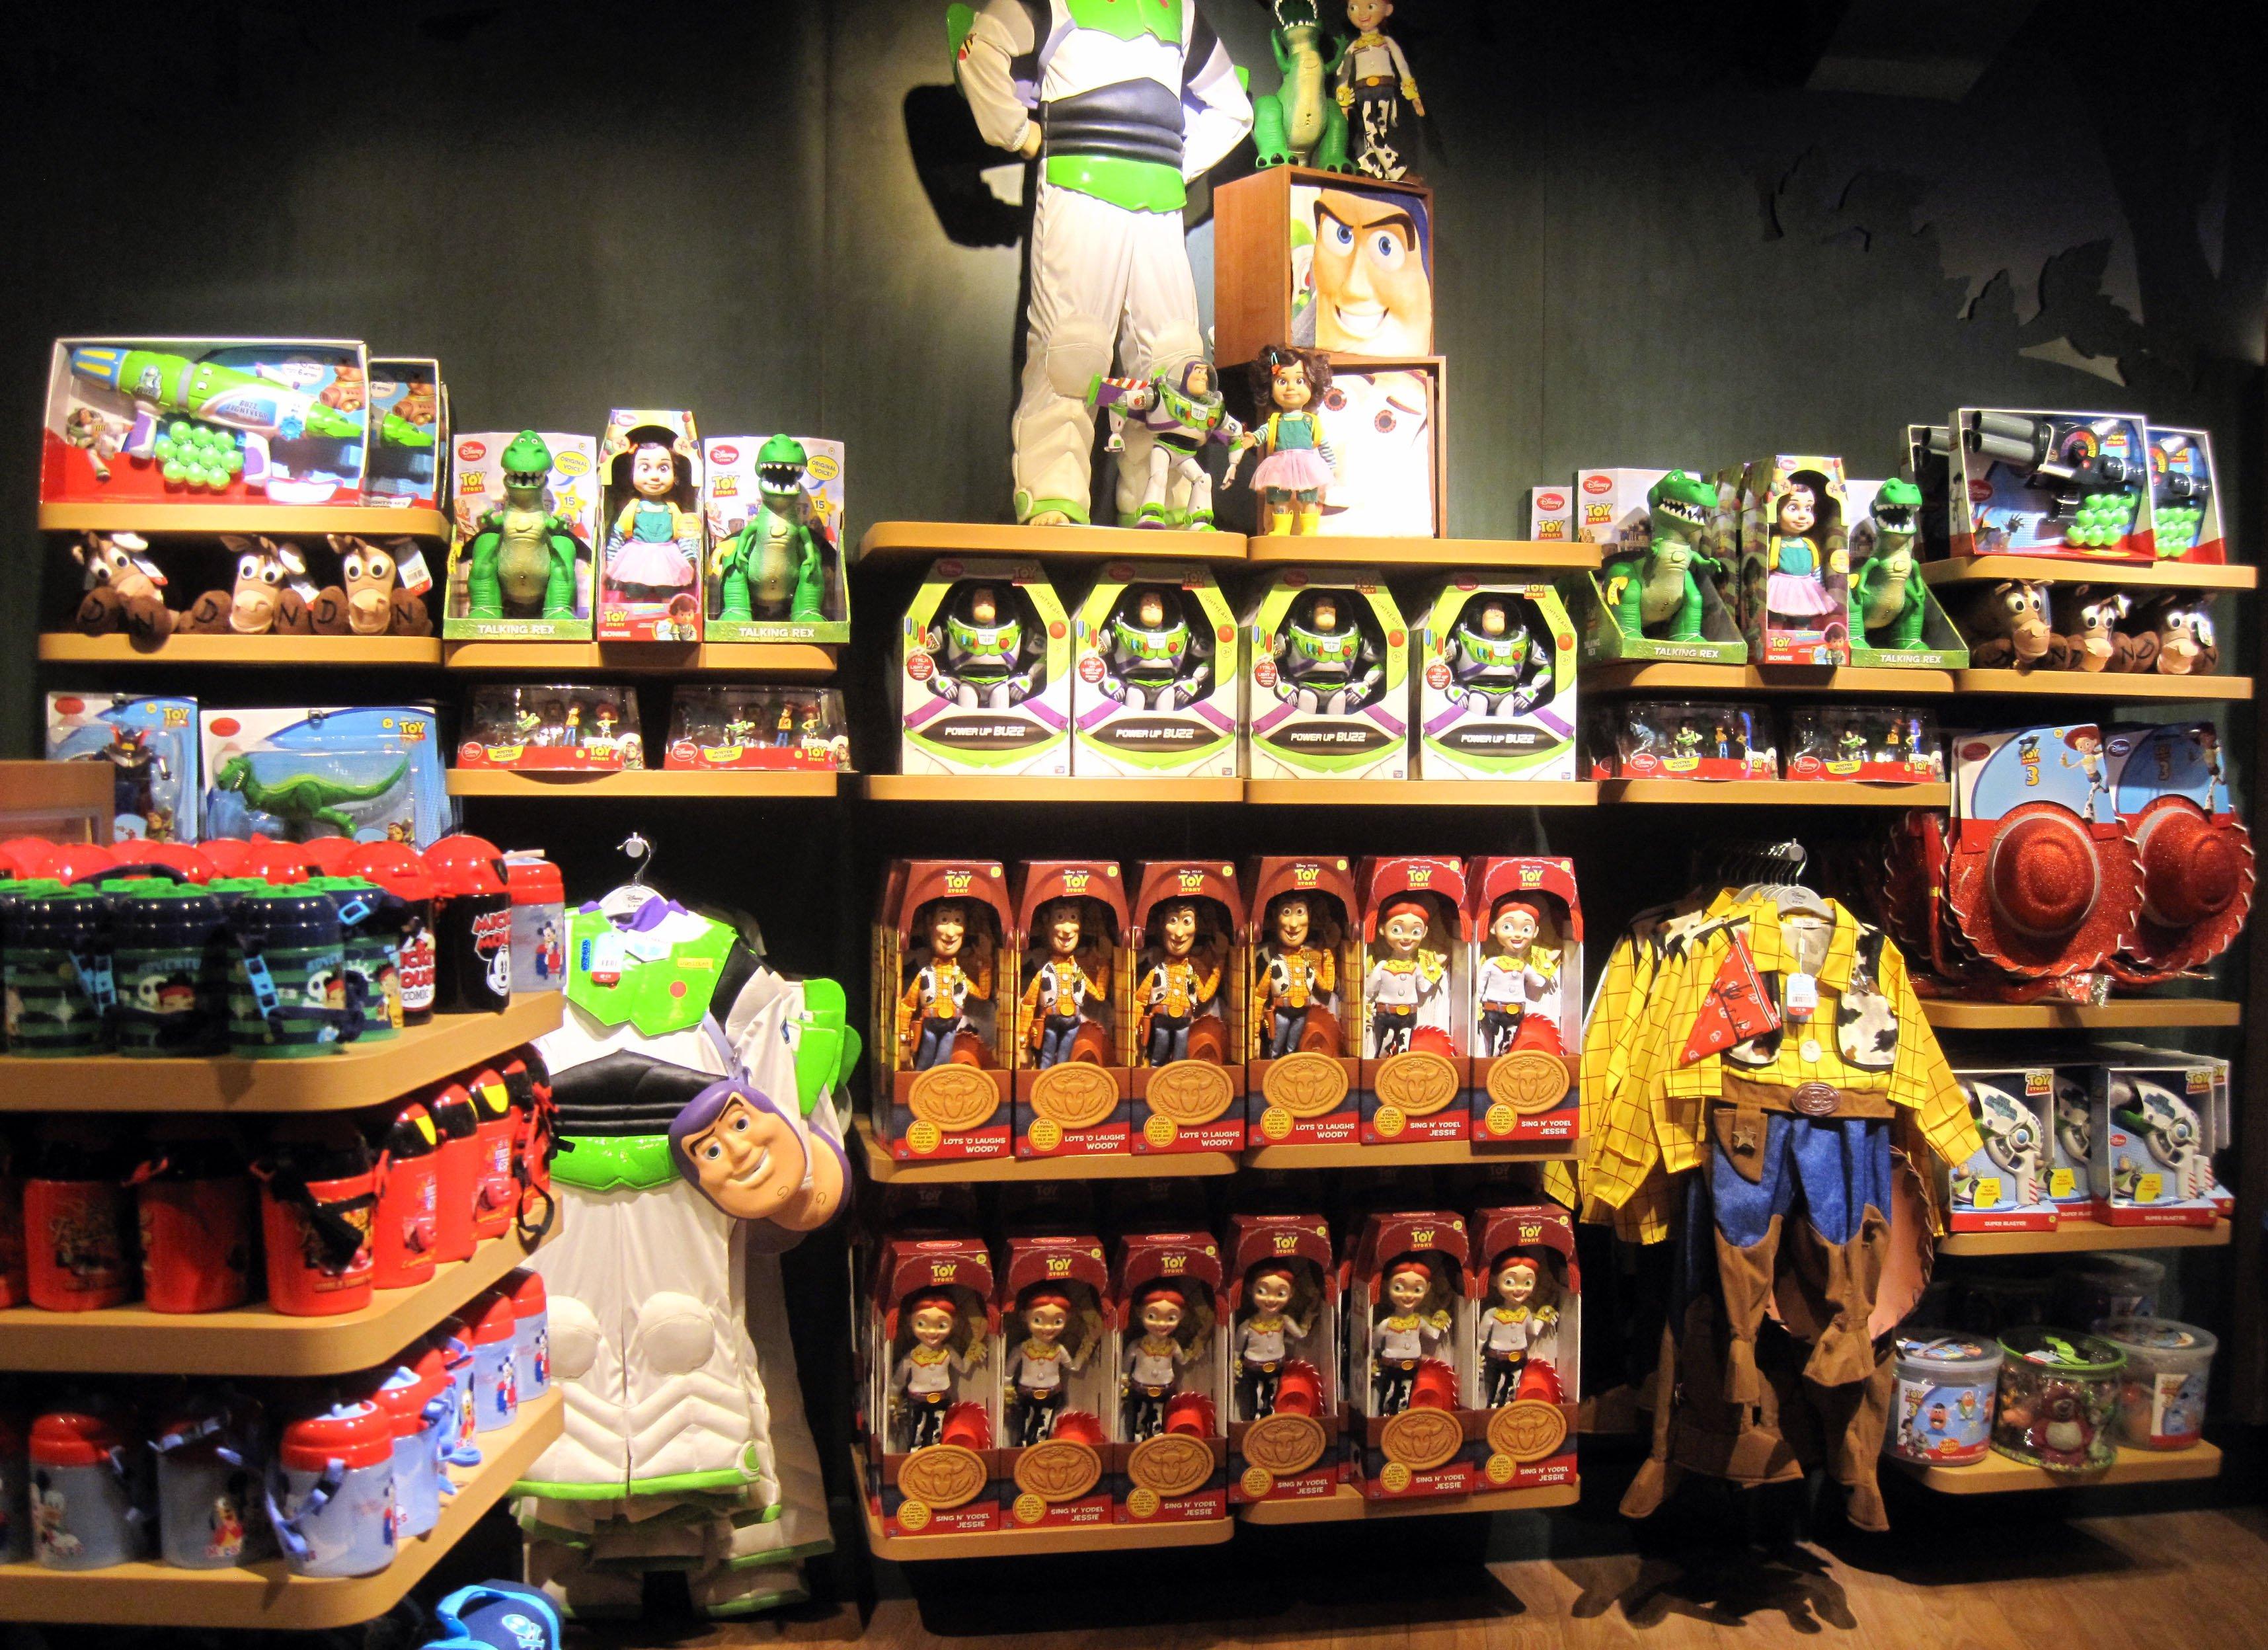 Disney Store Toys : Galleries ispira